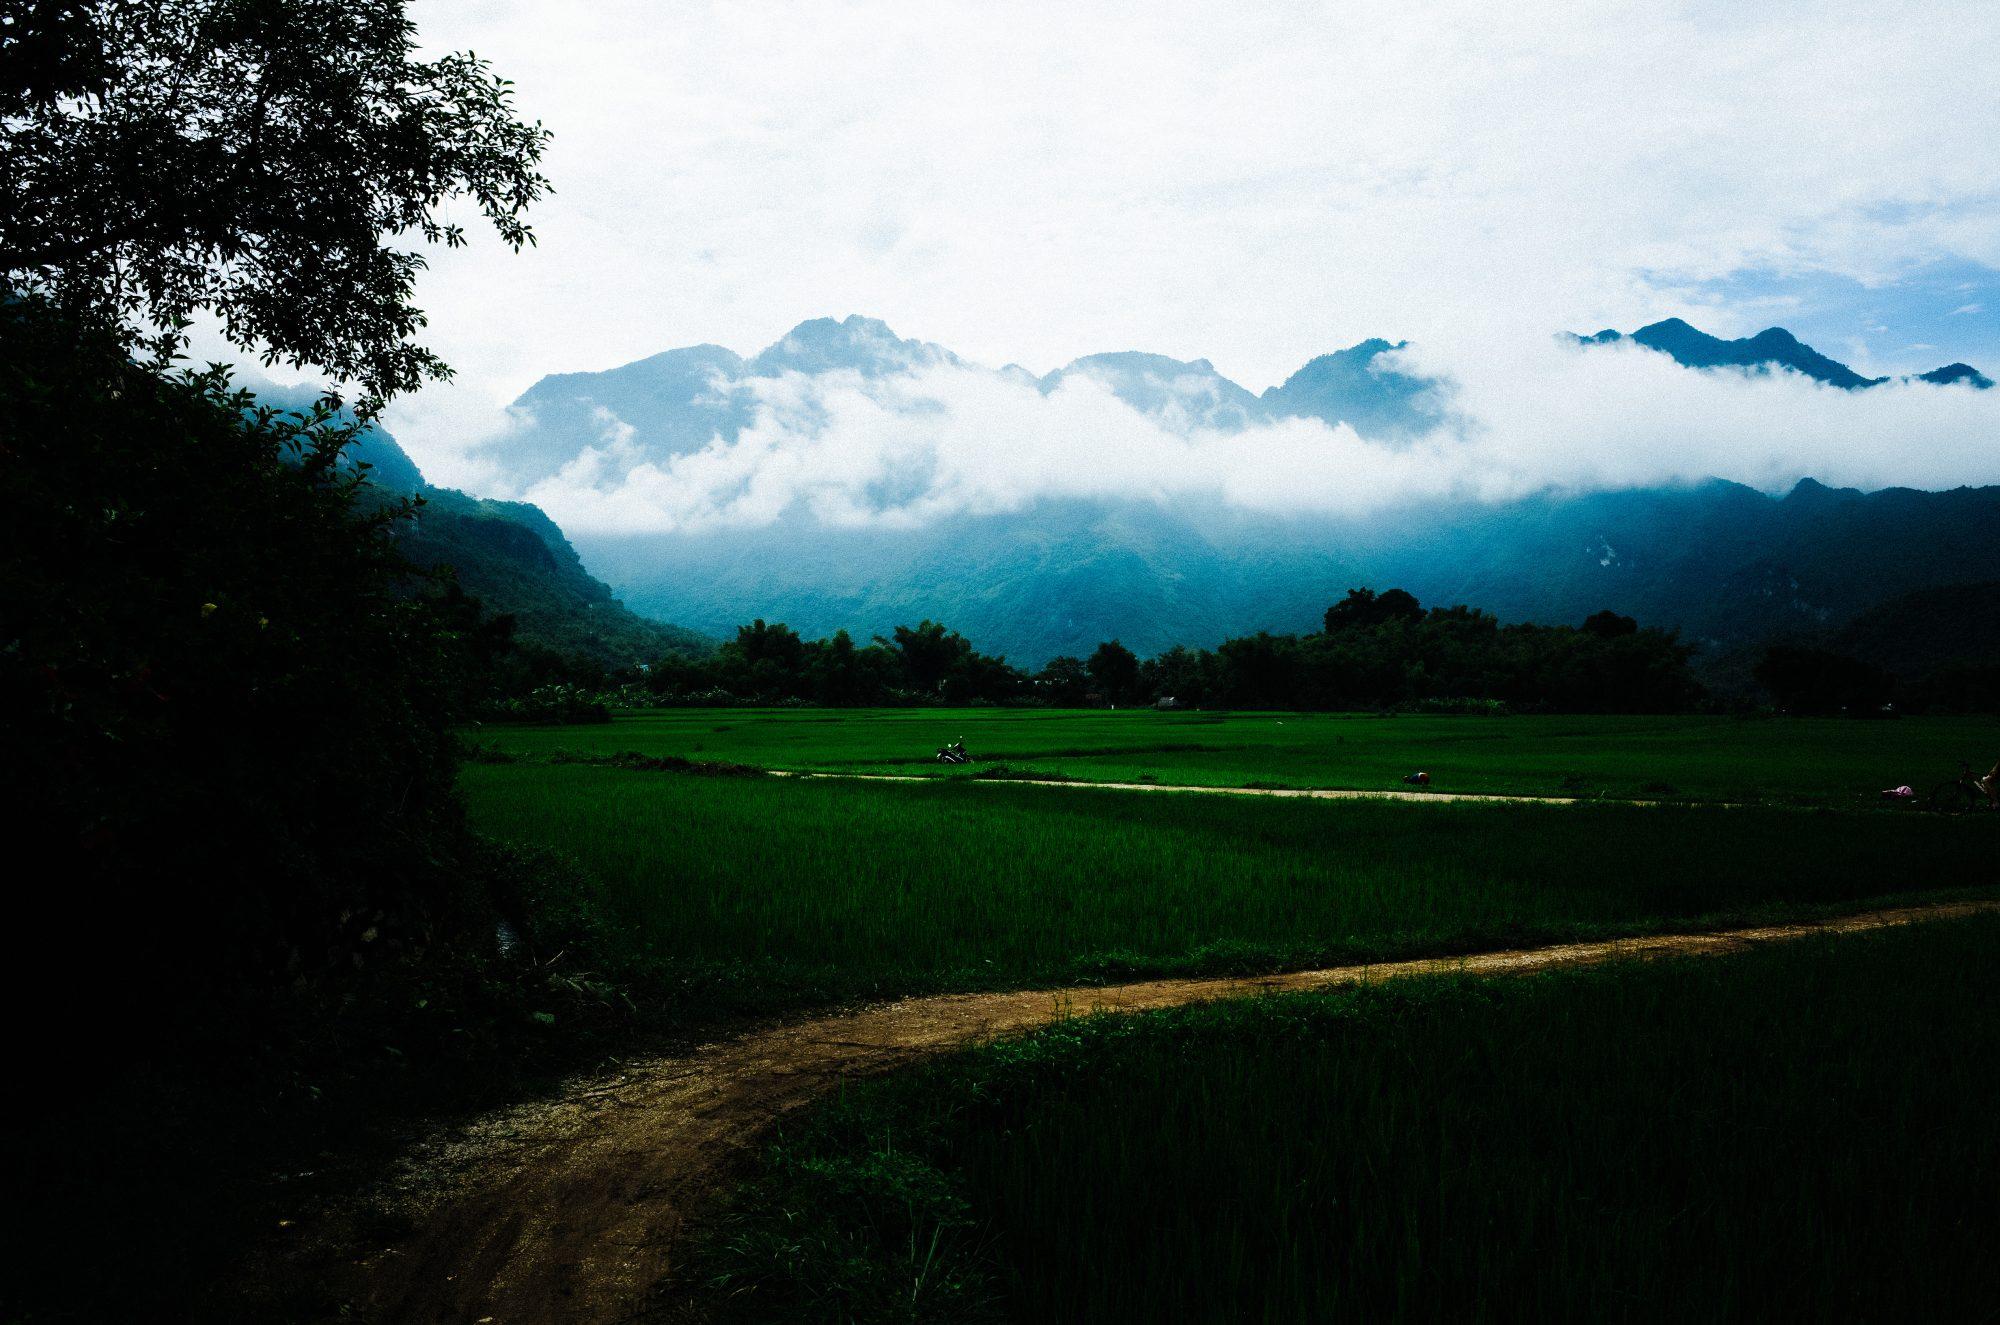 eric-kim-street-photography-hanoi-vietnam-ricoh-gr-ii-28mm-0005387